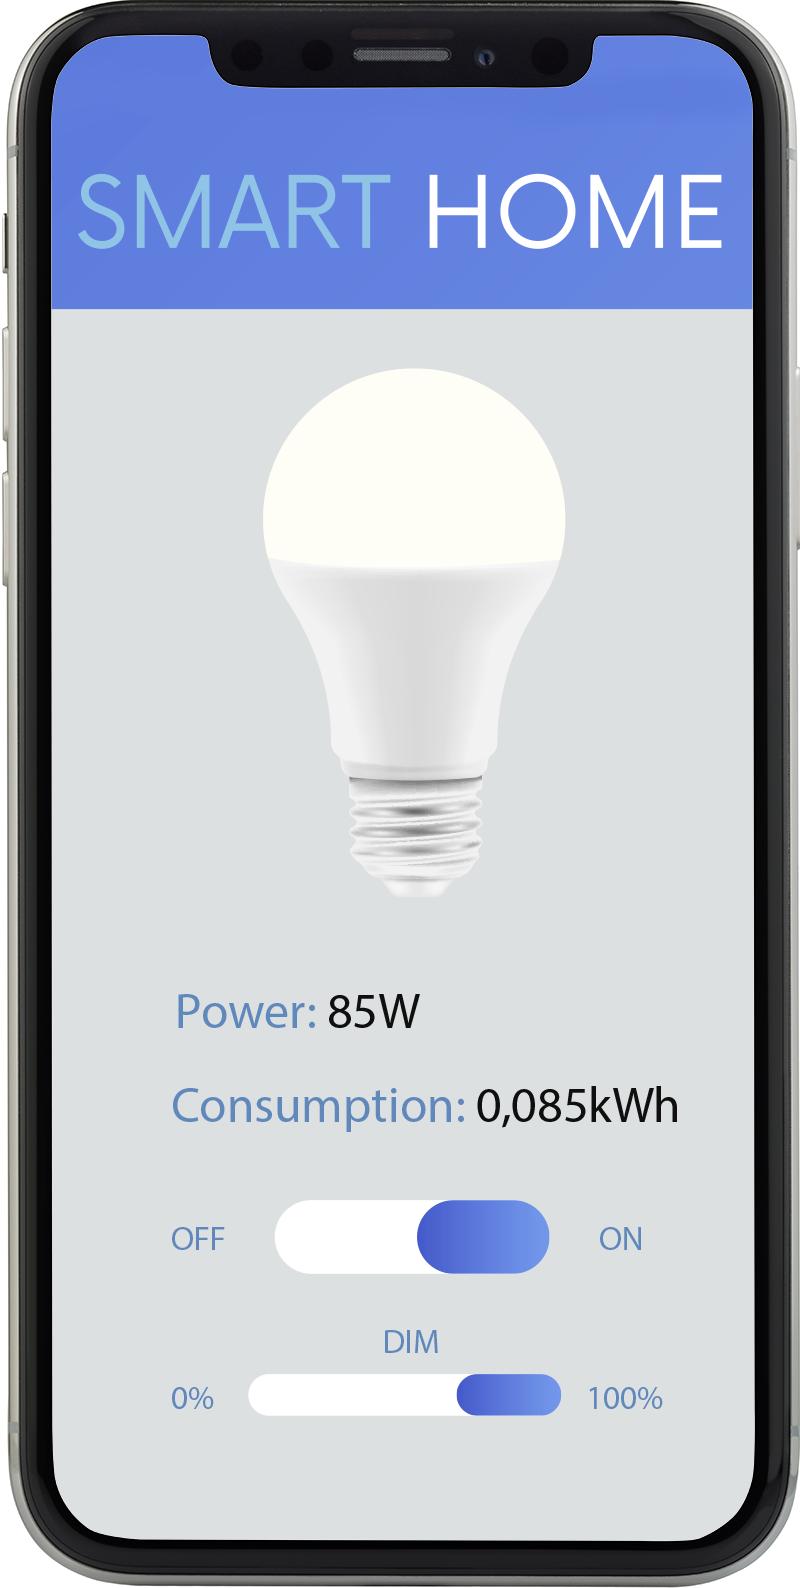 remote-lighting-control-app